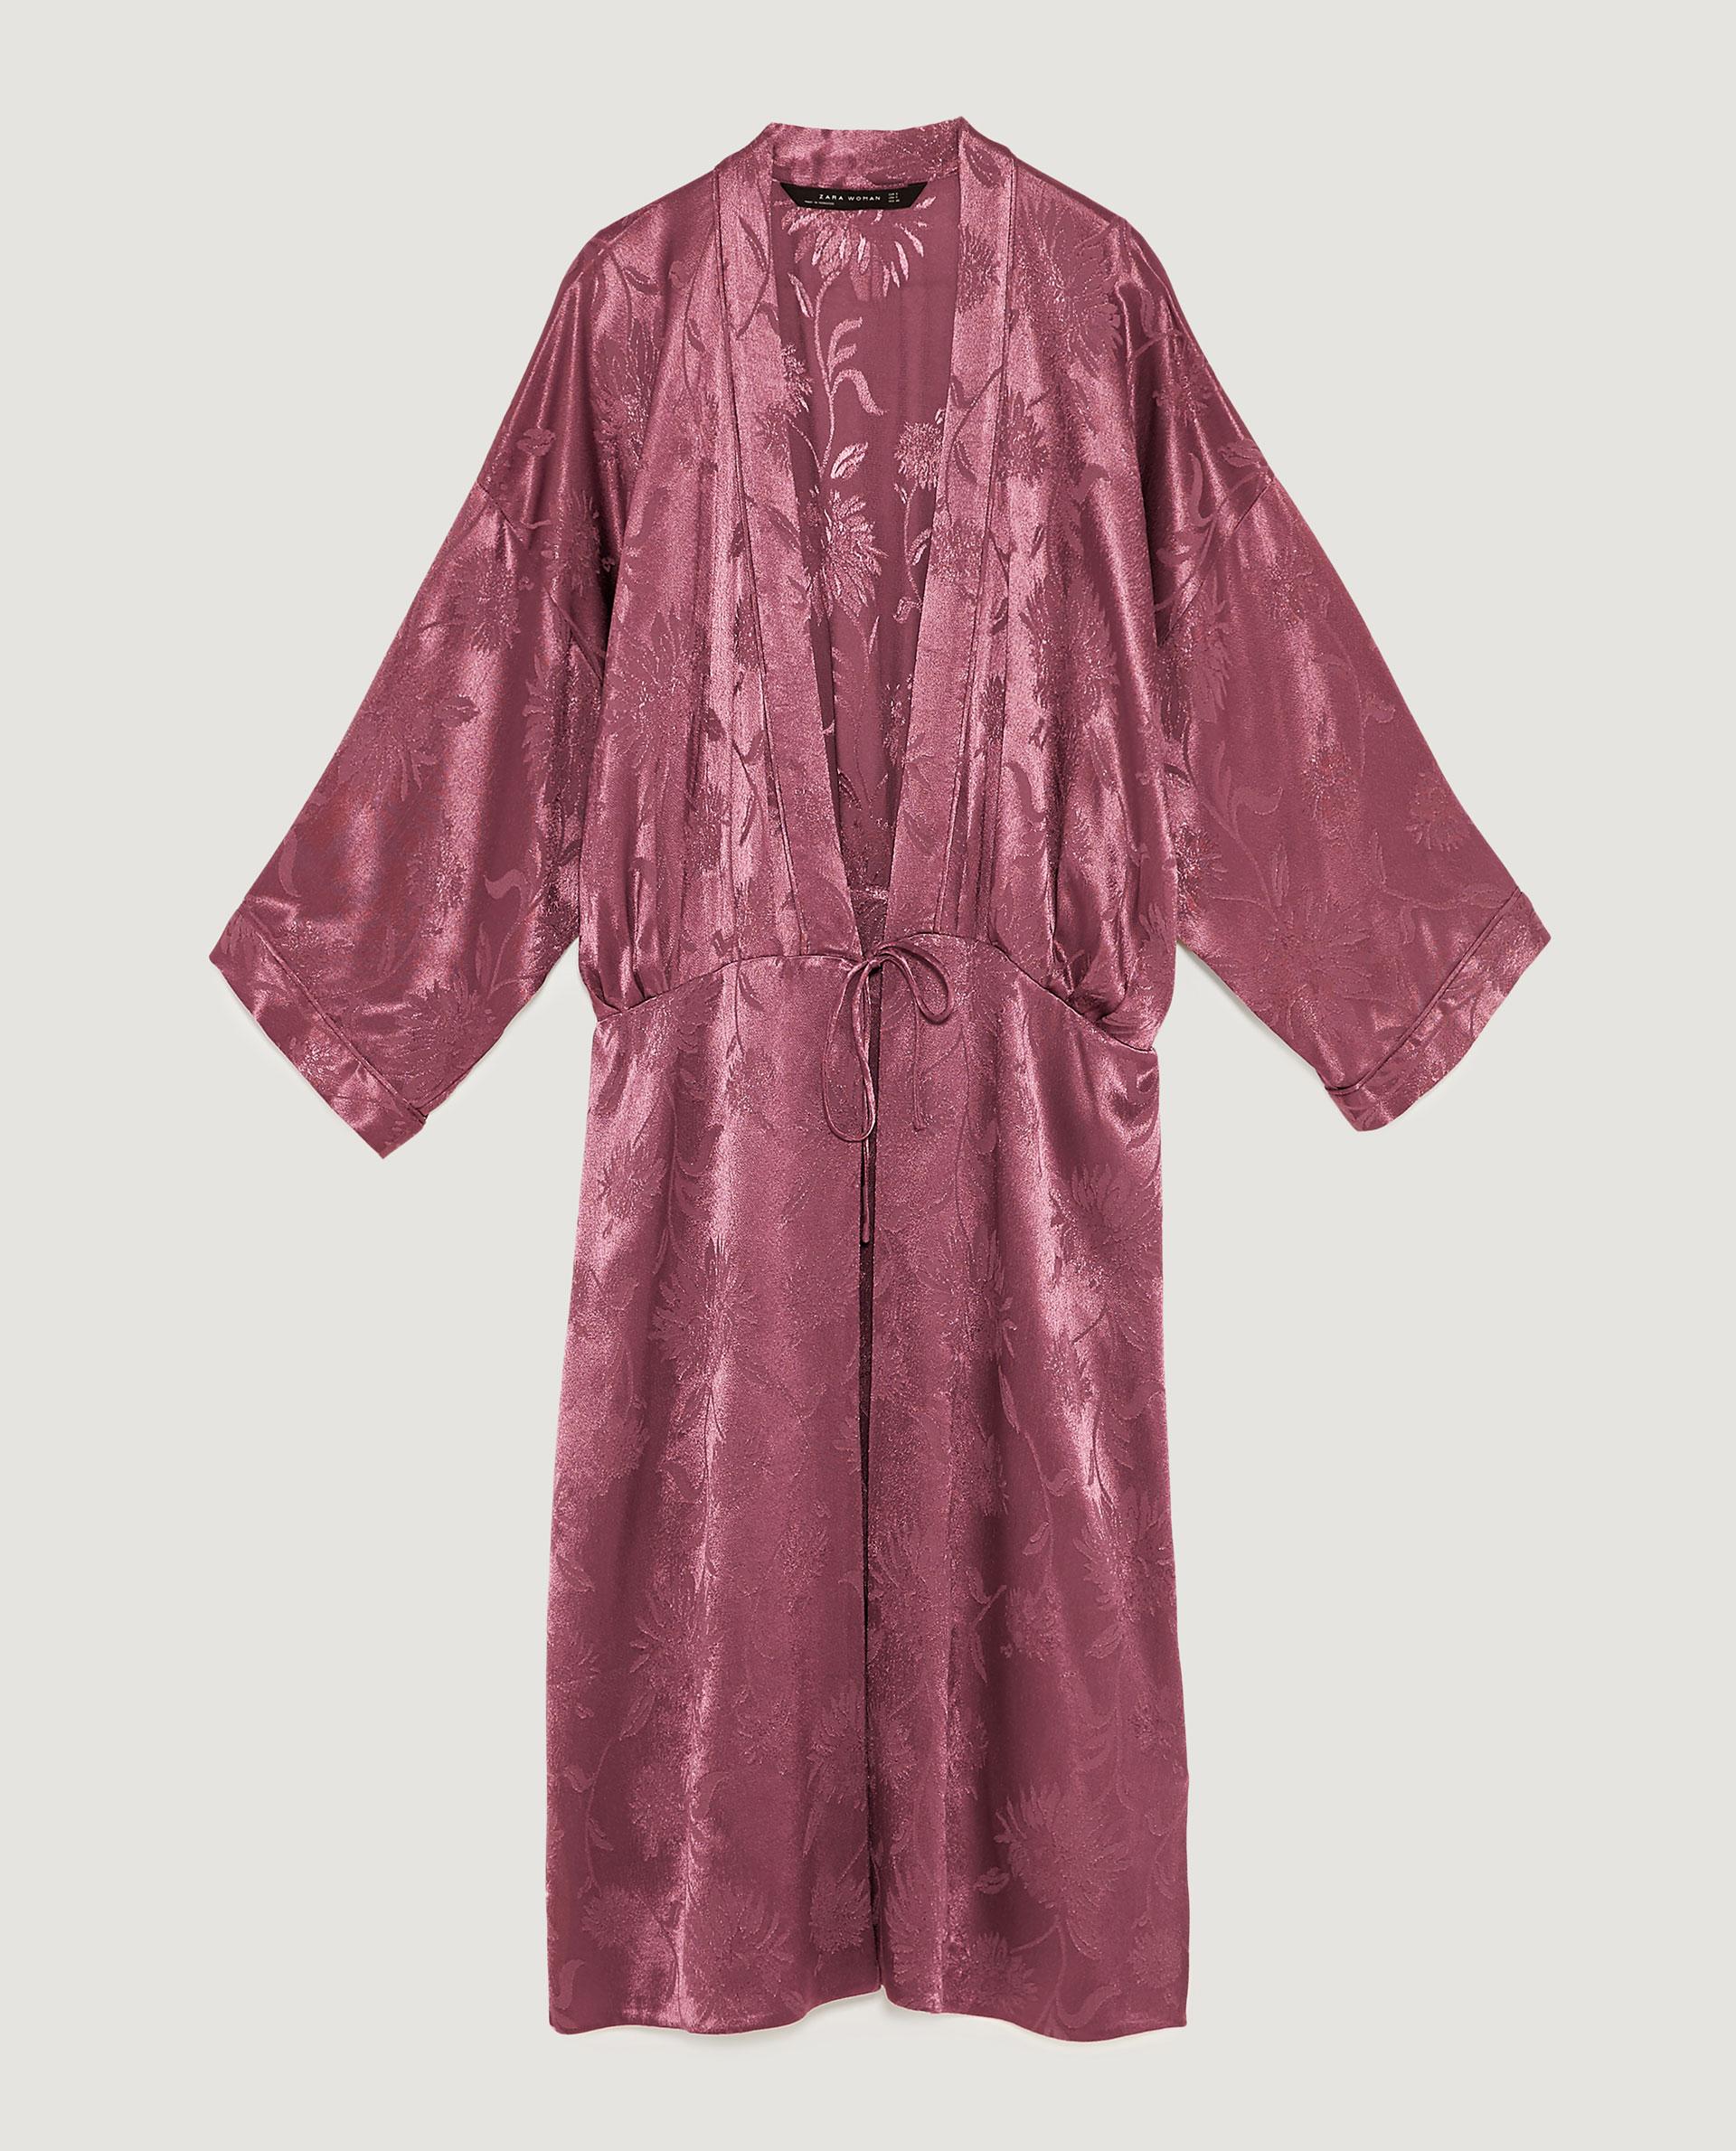 just in case you need the kimono too  Shimmery Jacquard Kimono / $80 / Zara